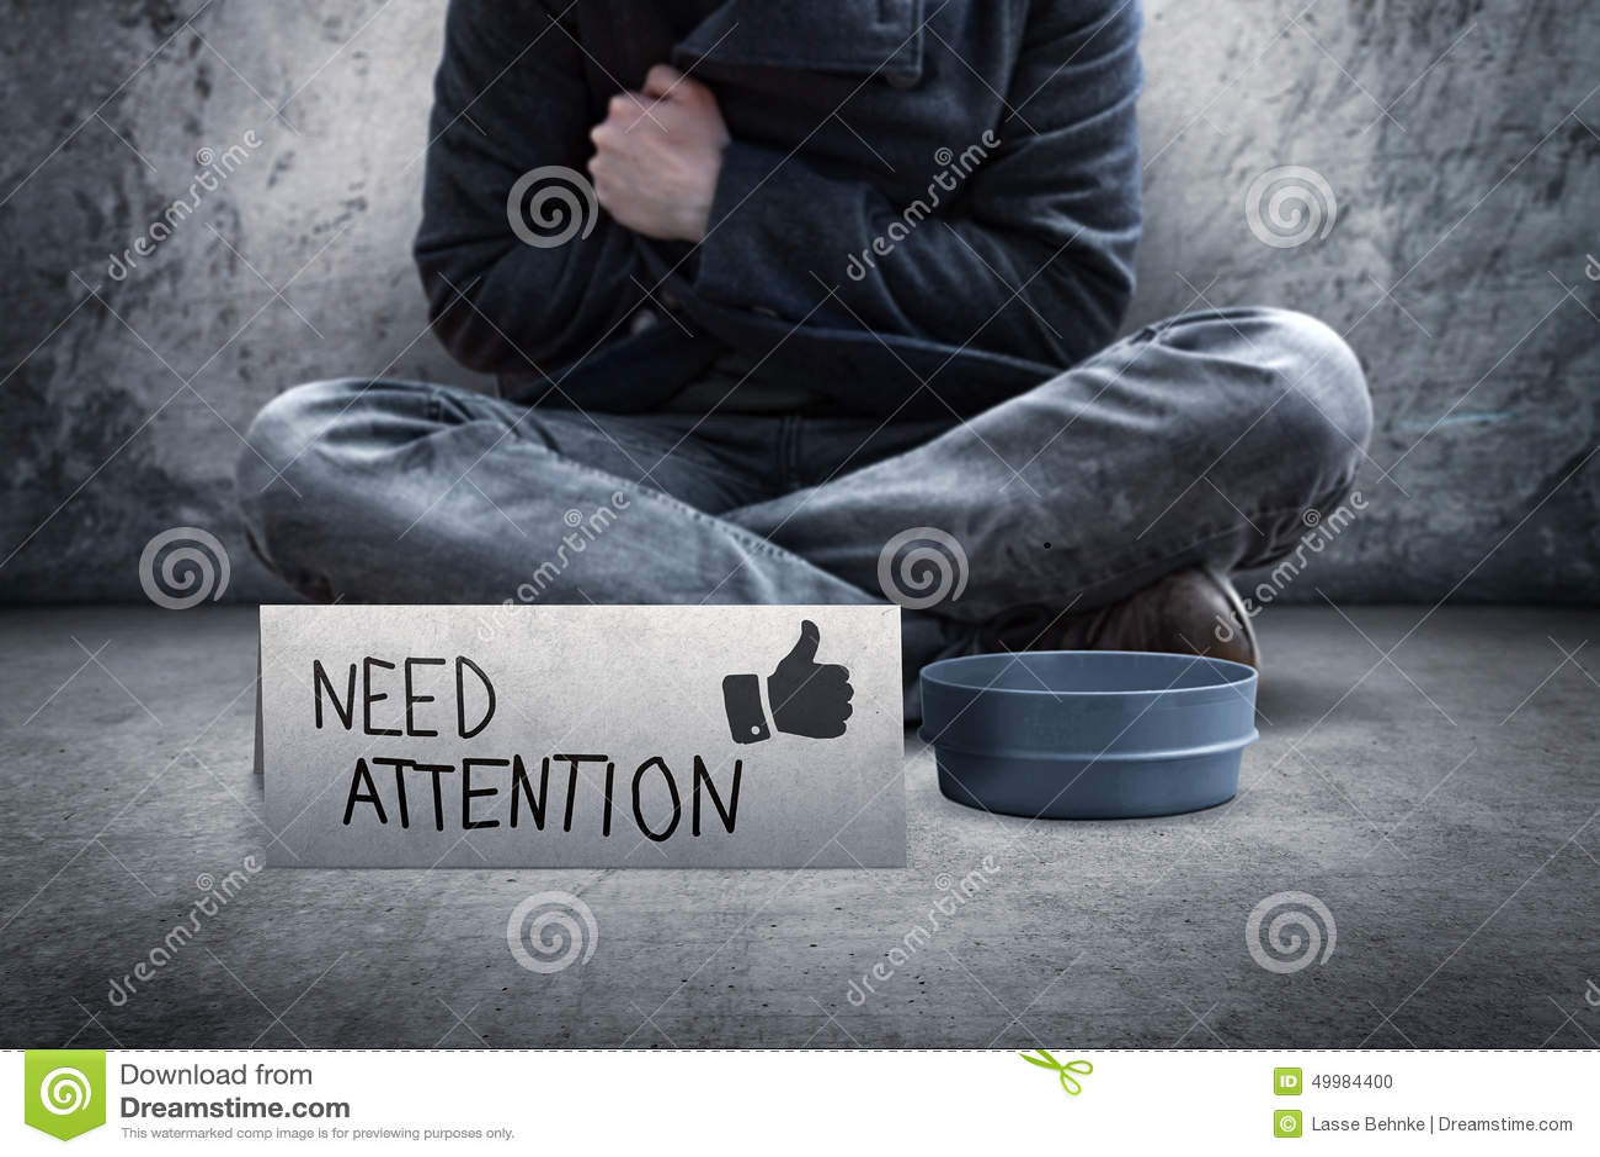 Attention du besoin